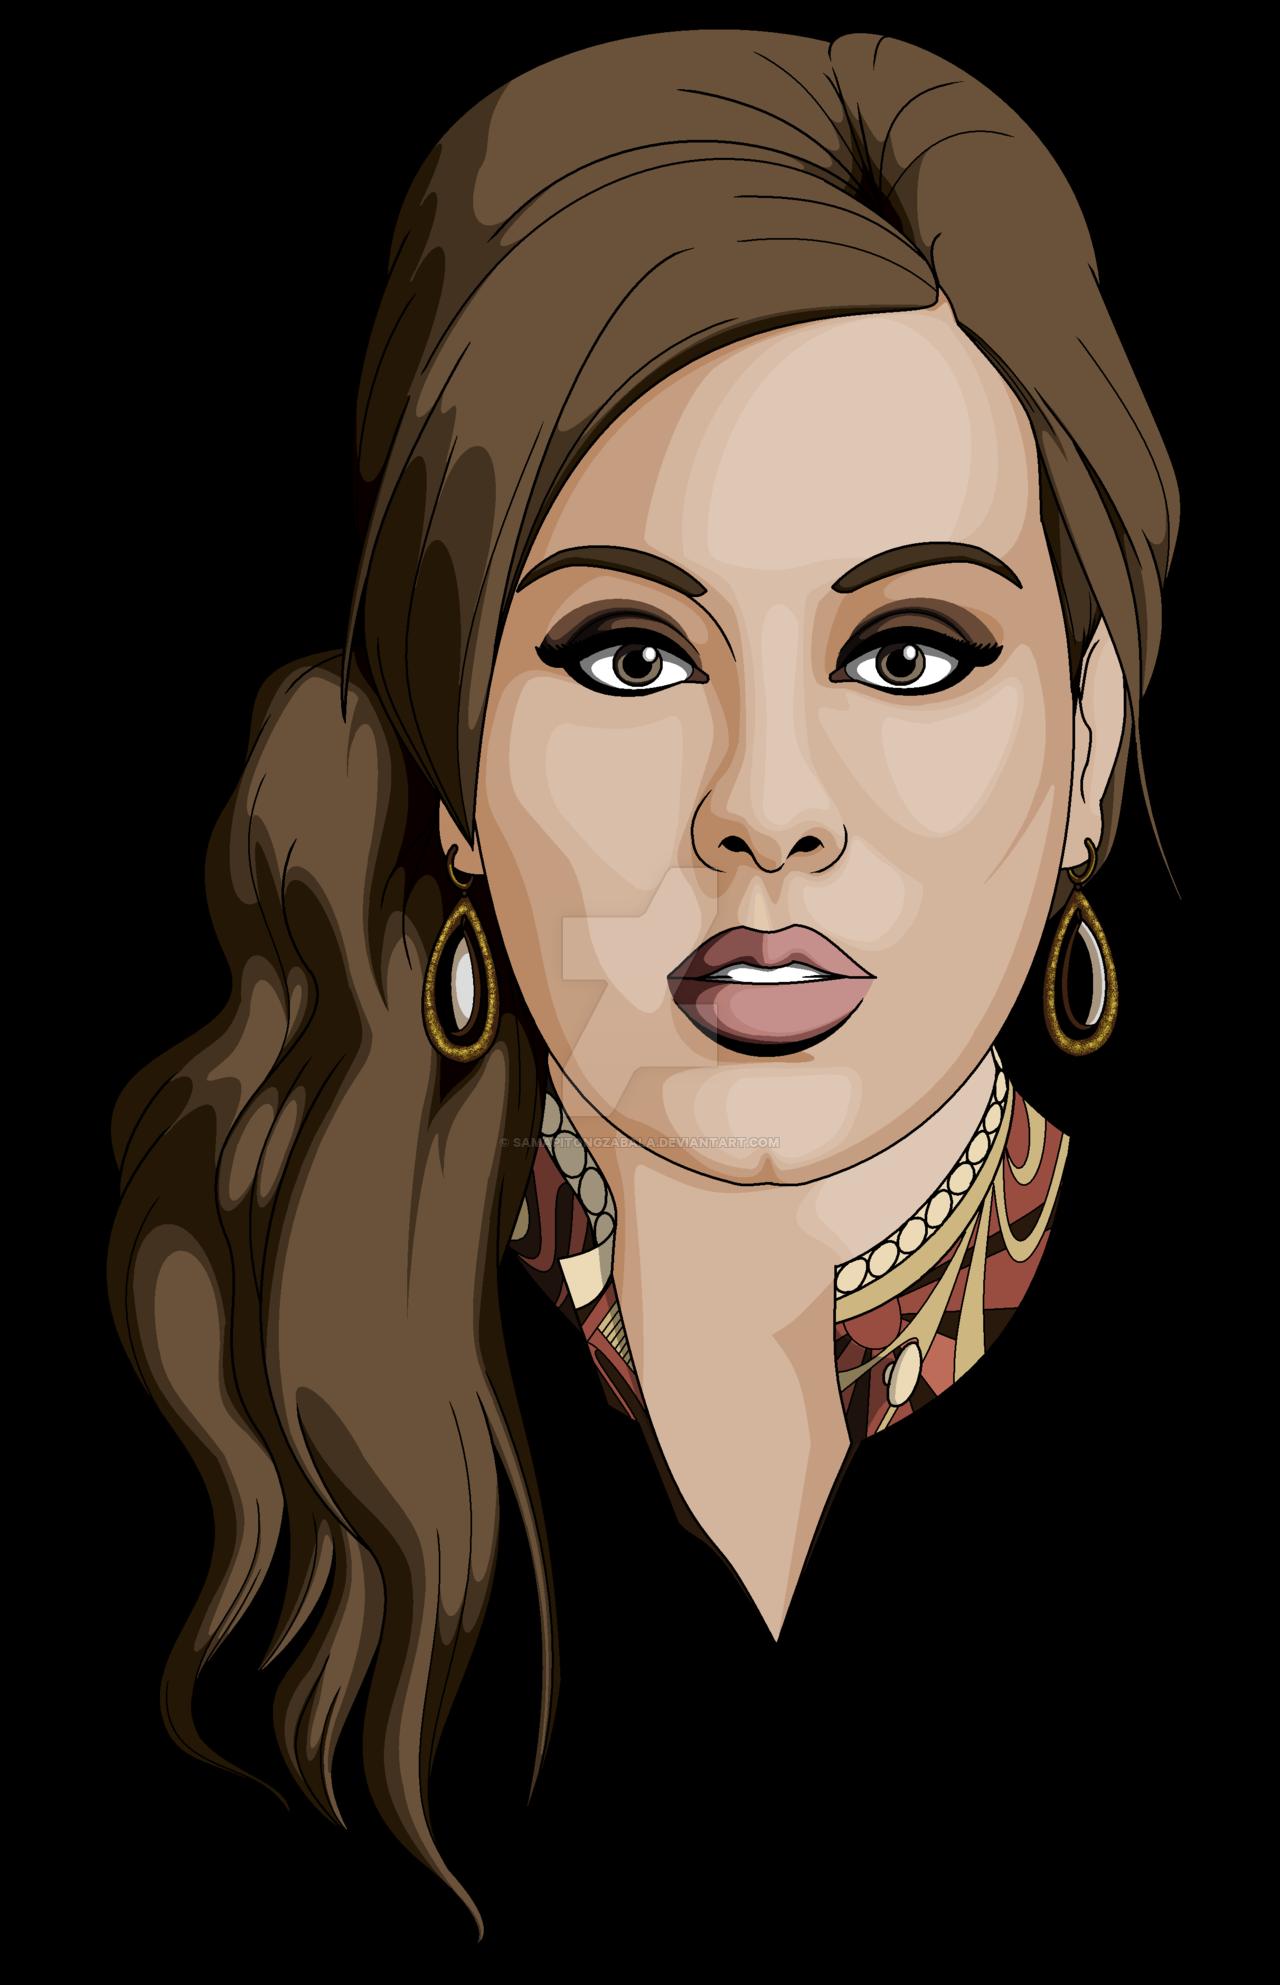 Drawn celebrity ms paint #5